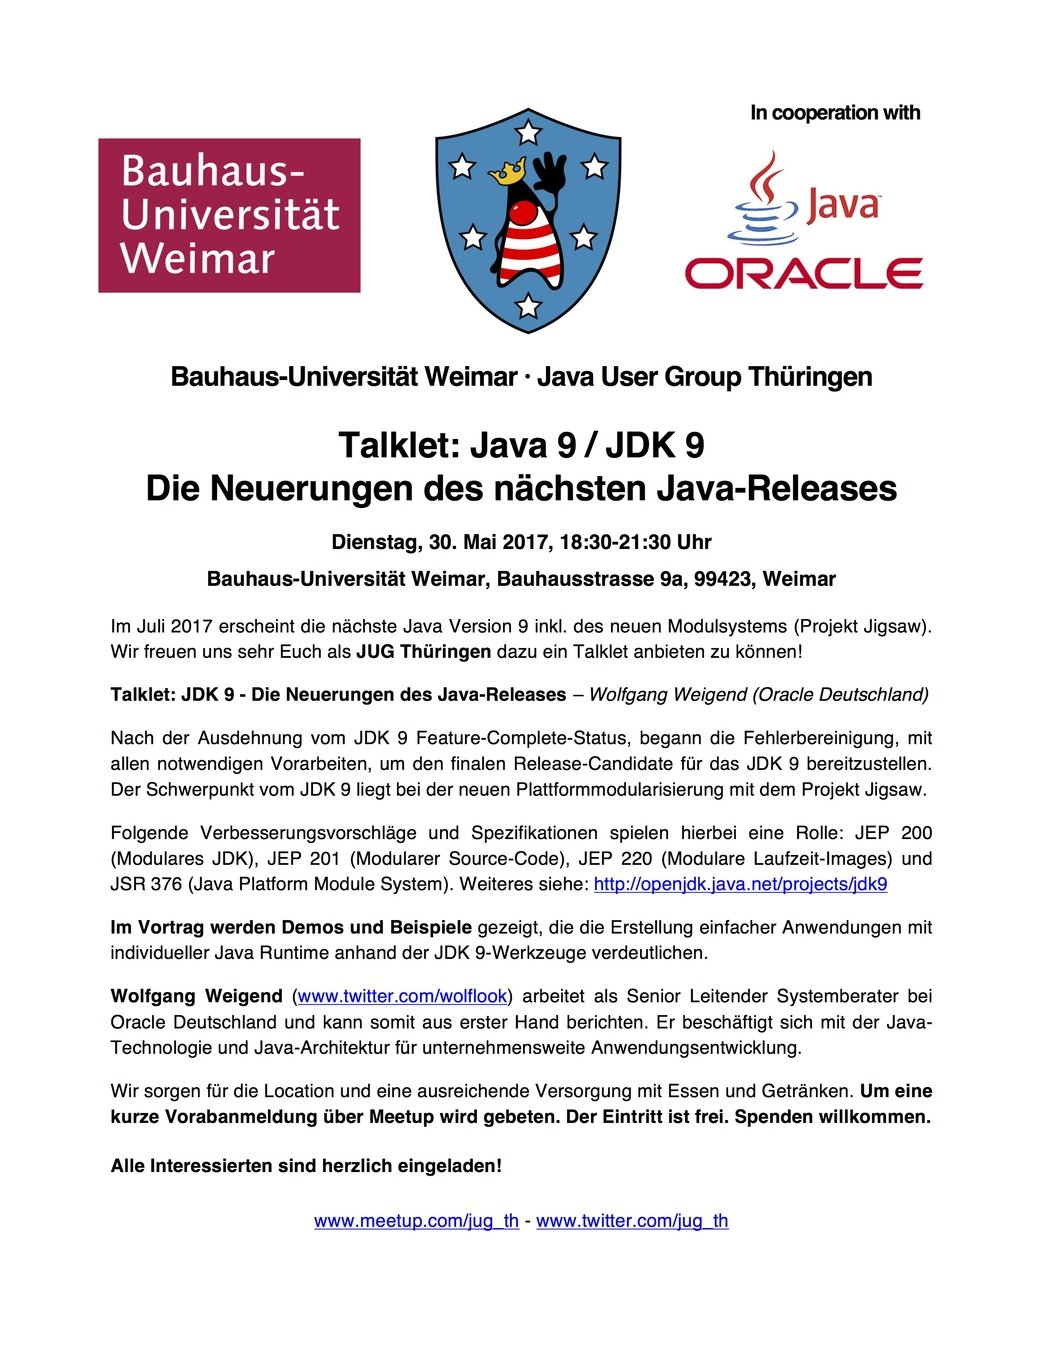 jugthde - Java User Group Thüringen